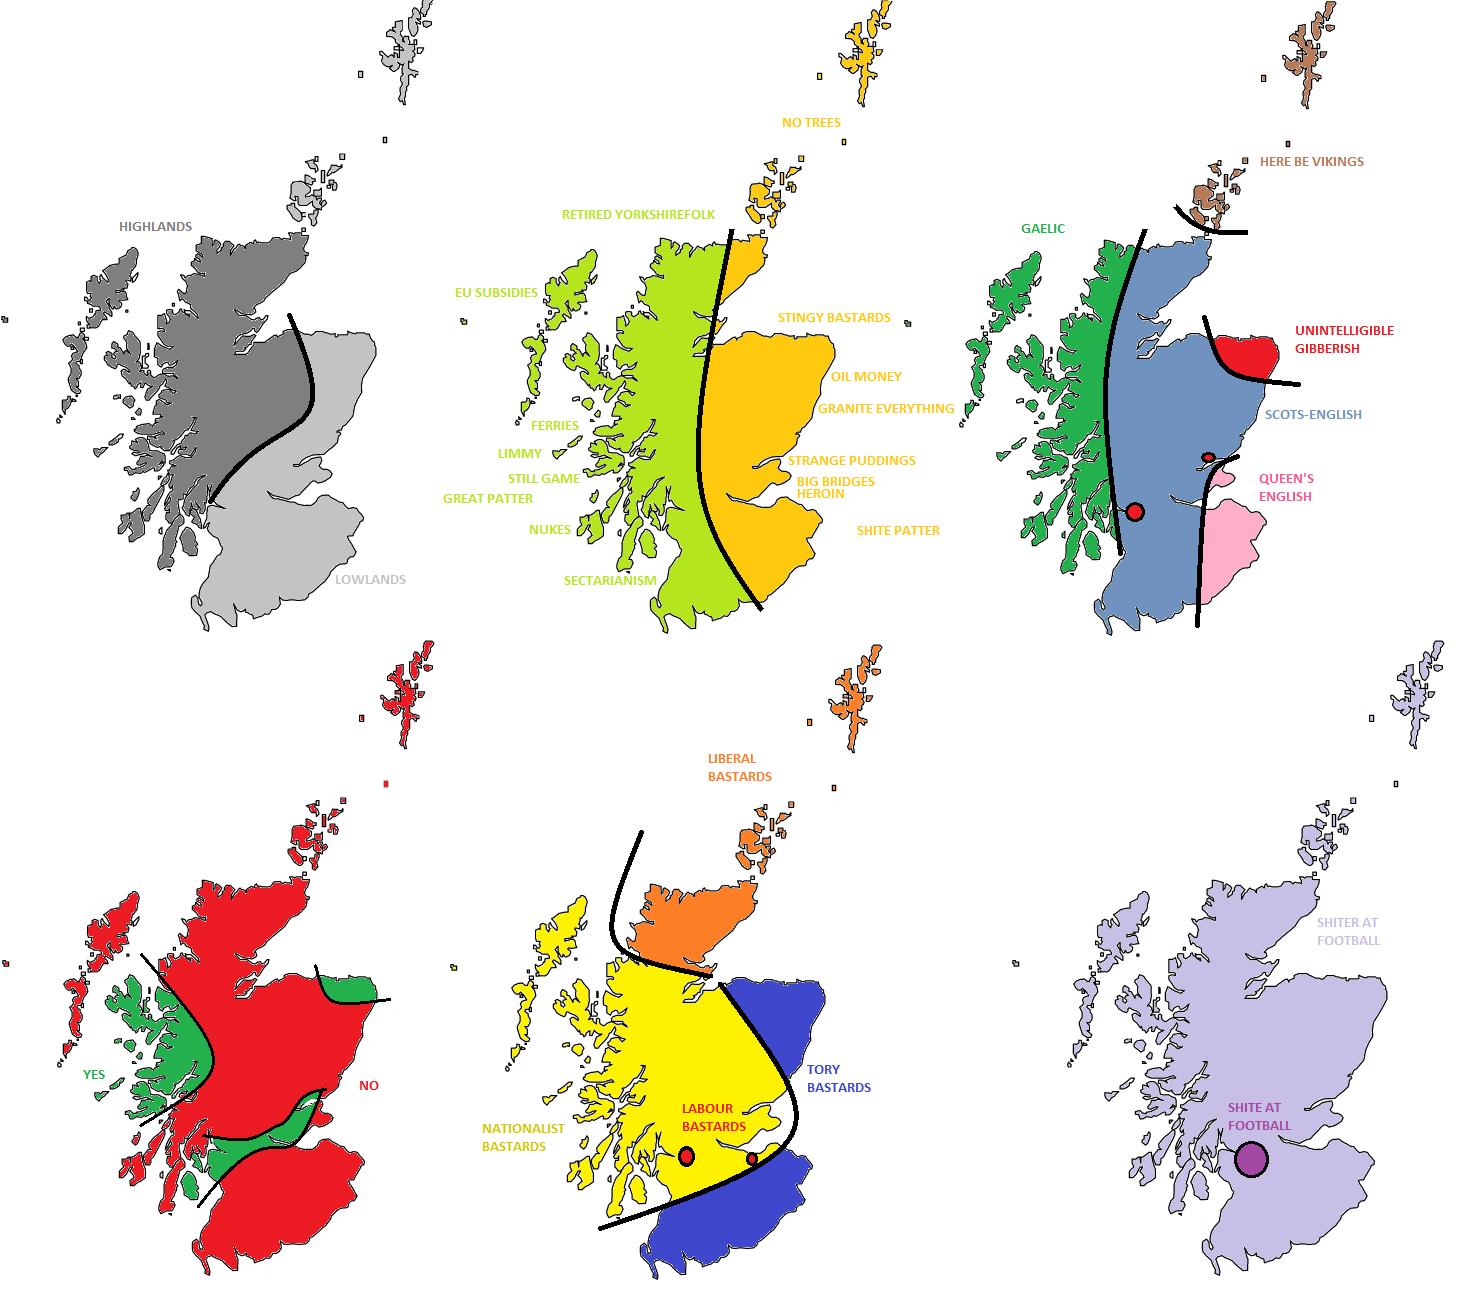 scotland1.png